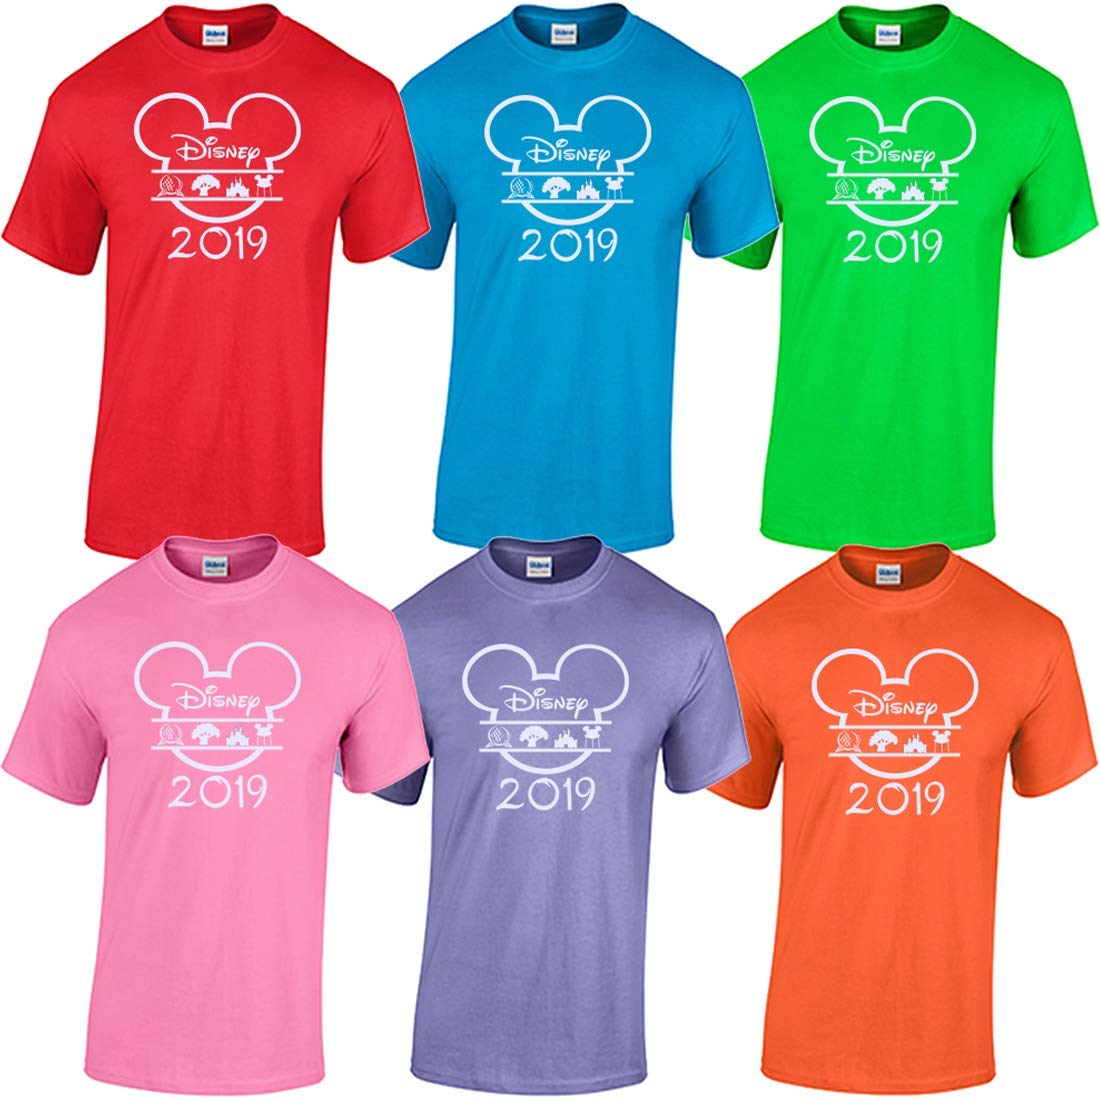 631c5518b Amazon.com: Matching Family Vacation Shirts Mickey Mouse Minnie Matching  Shirts Custom 2019: Clothing